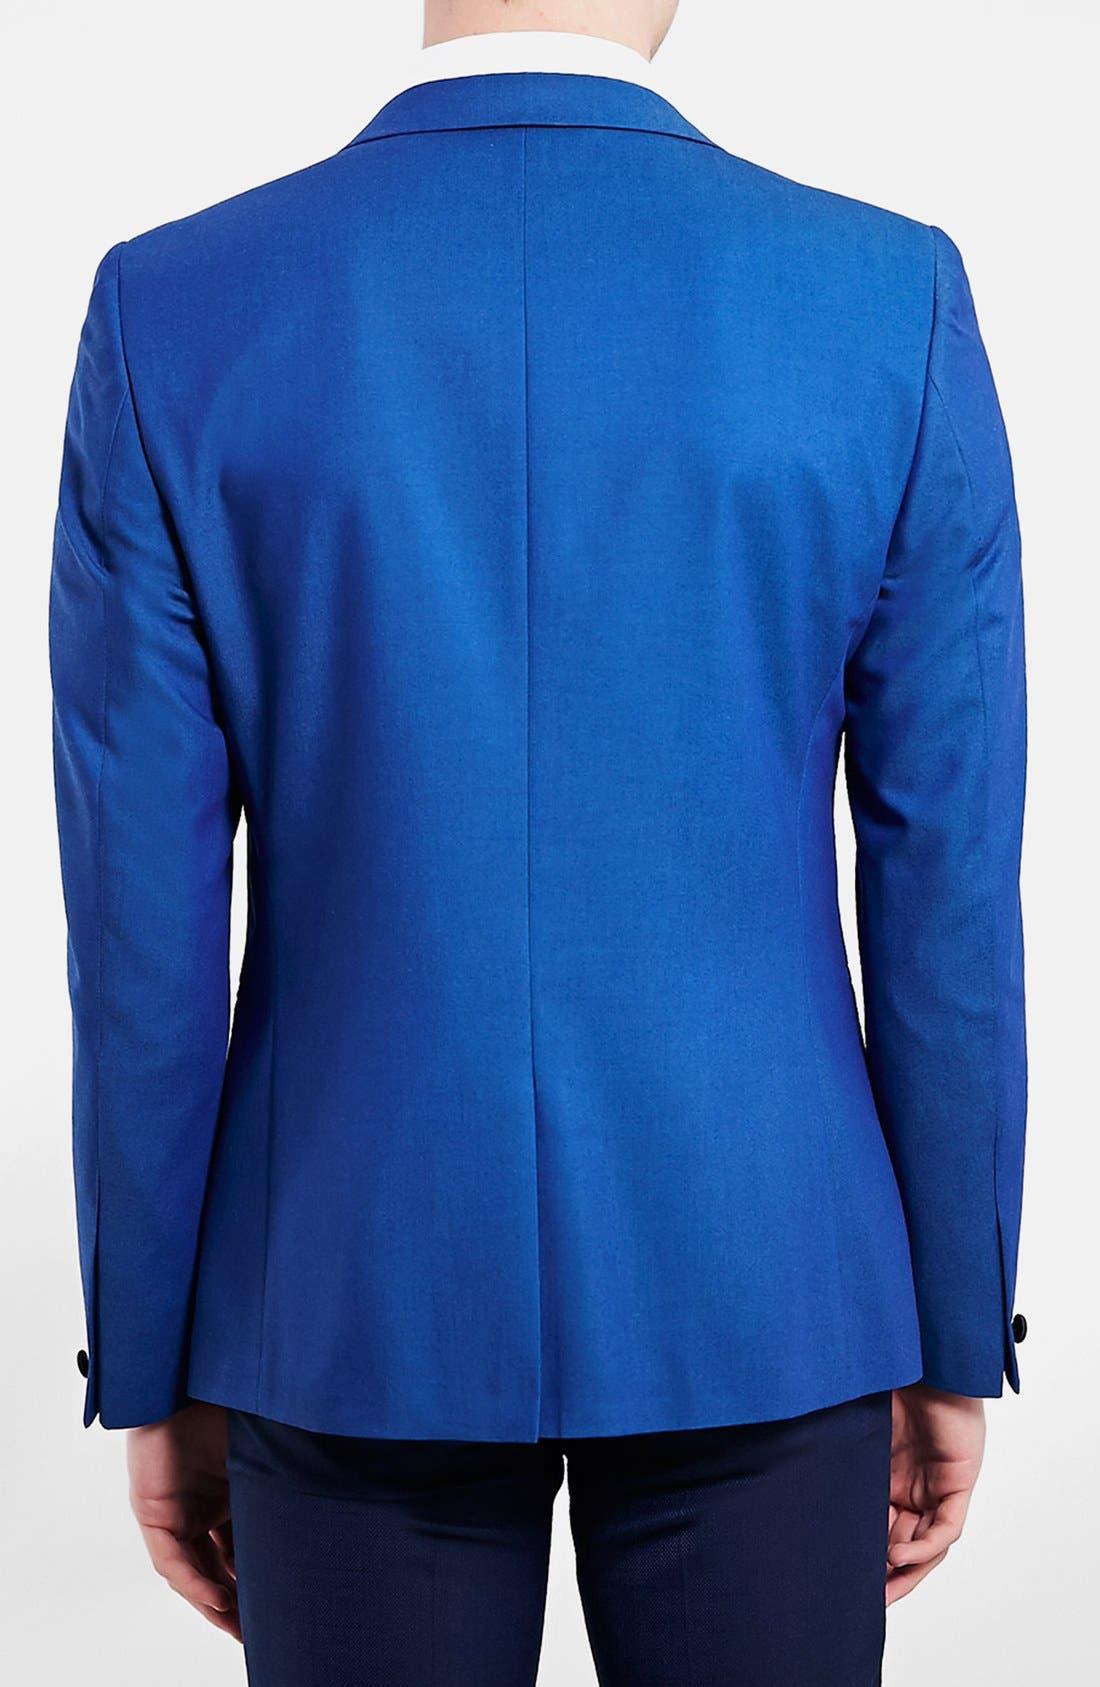 TOPMAN, Blue Skinny Fit Tuxedo Jacket, Alternate thumbnail 3, color, 400